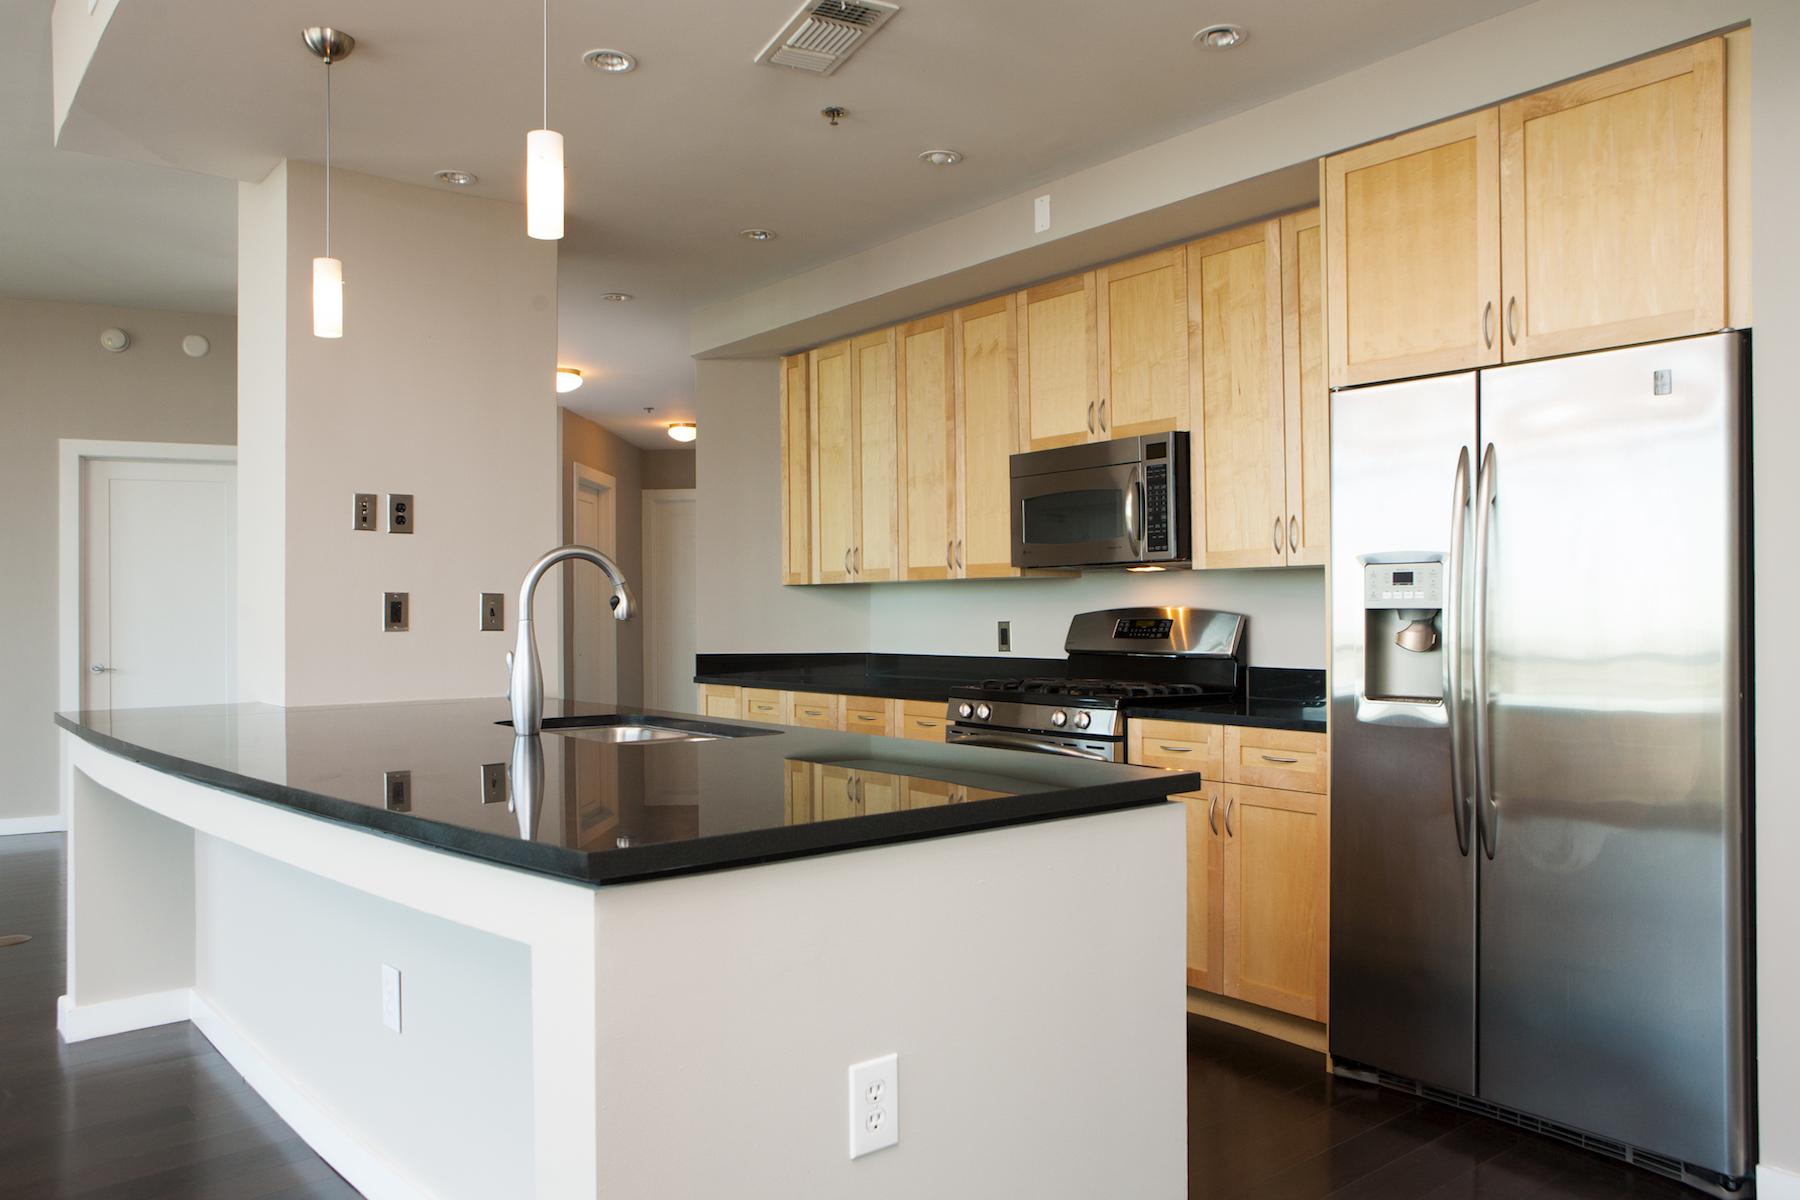 Condominium for Rent at Adelicia Corner Unit Rental 900 20th Avenue South #815 Nashville, Tennessee 37212 United States